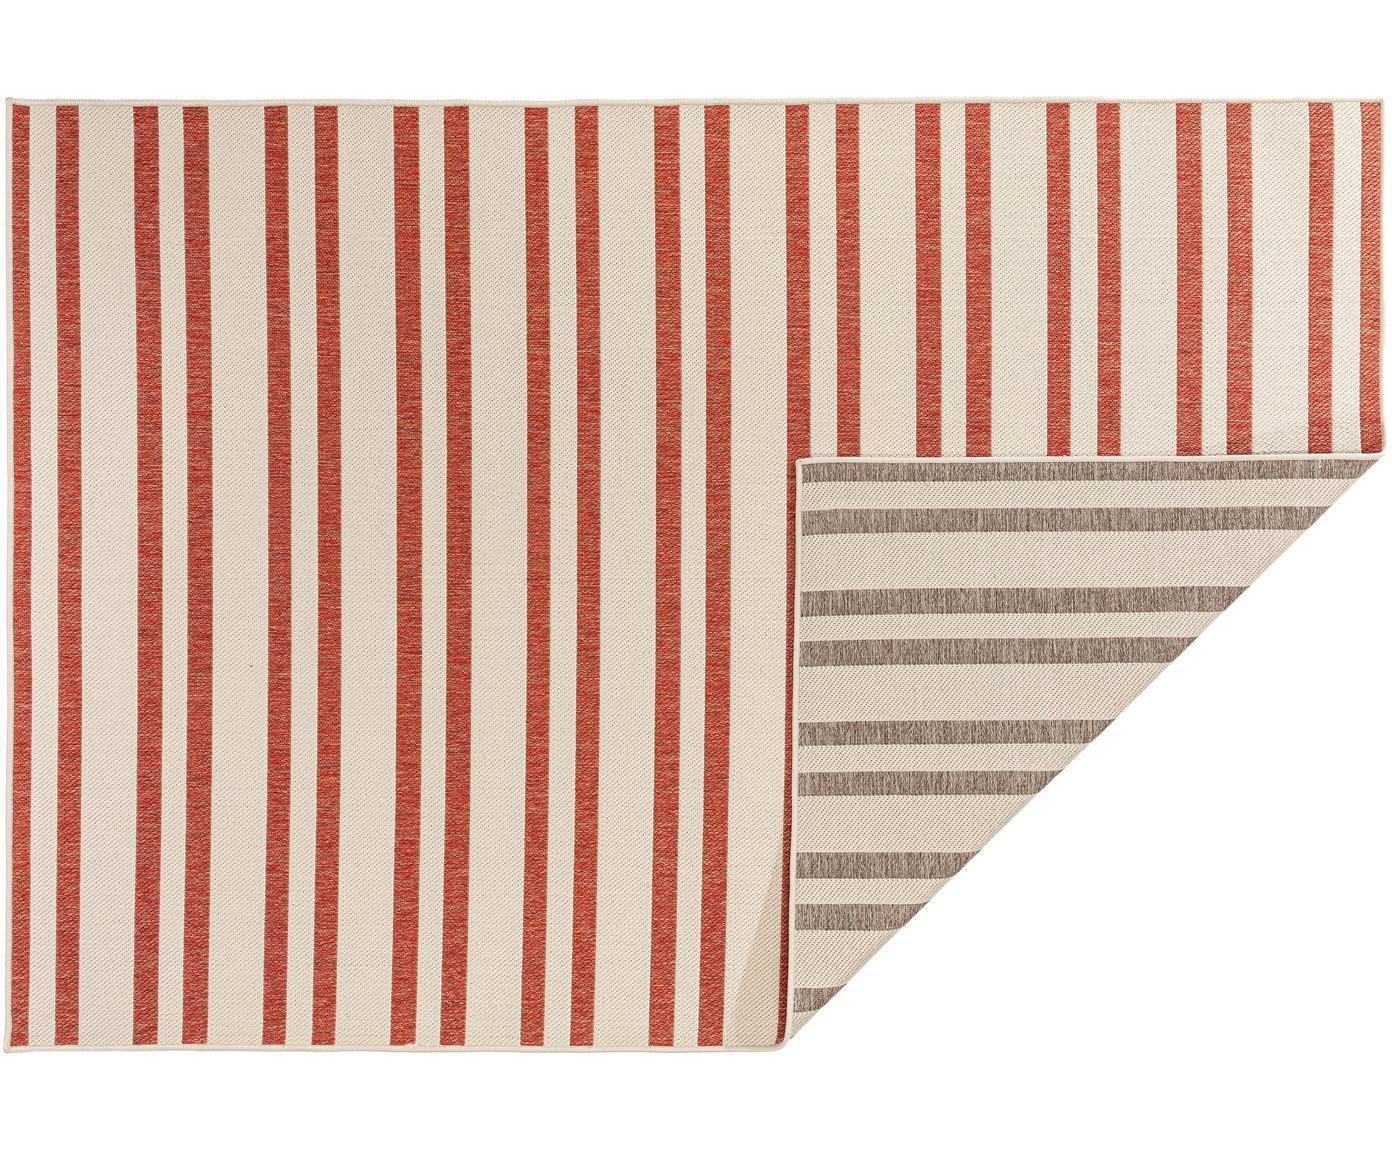 Alfombra reversible de interior/exterior Terrazo, Polipropileno, Beige, rojo, An 120 x L 180 cm (Tamaño S)